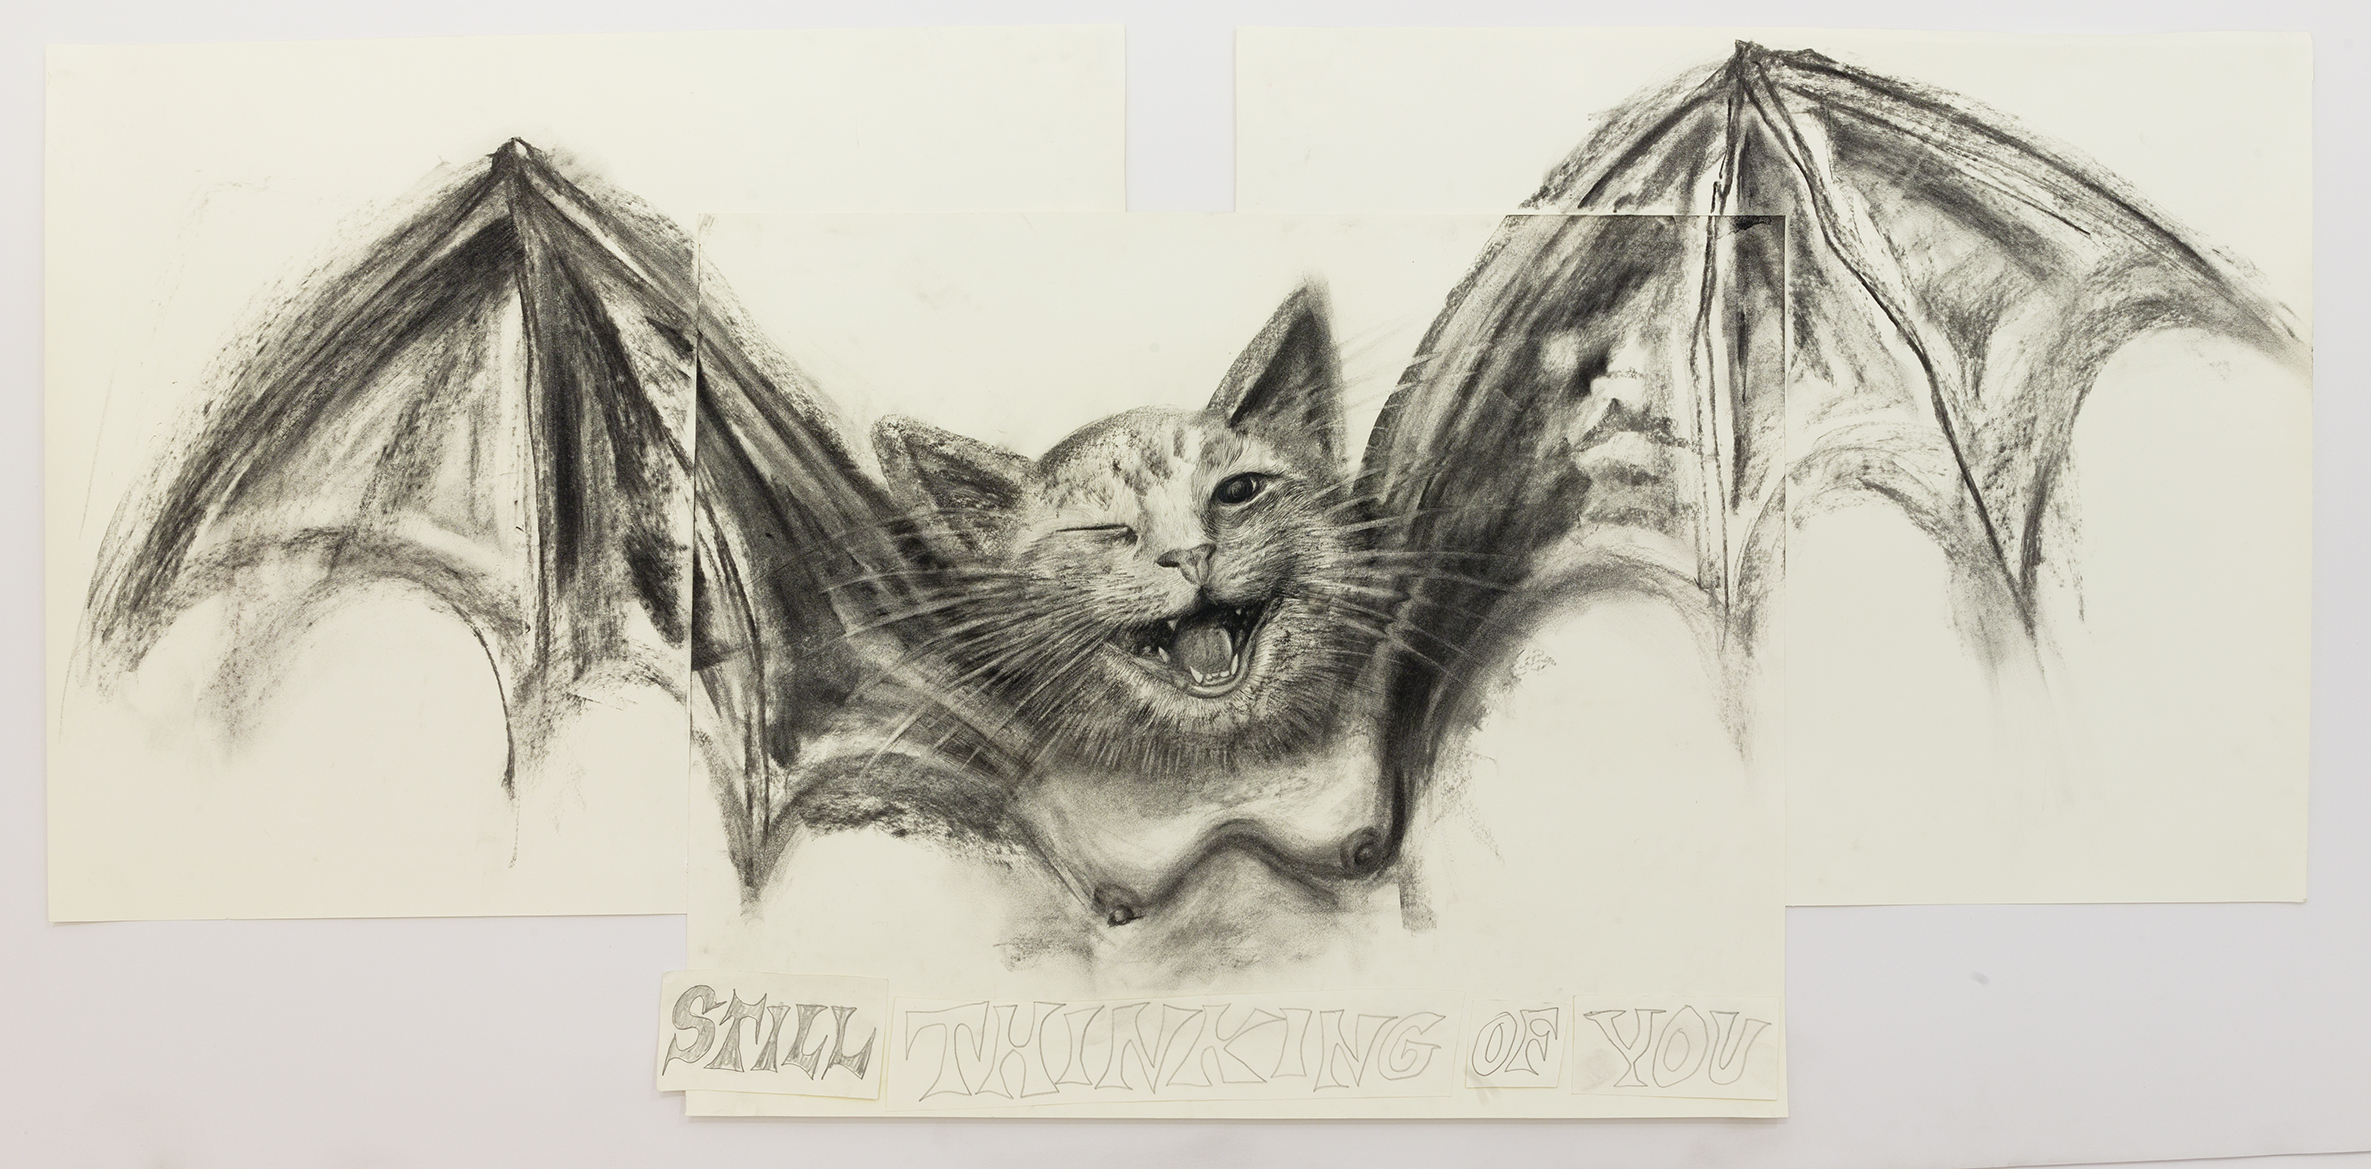 aurel_schmidt_kings_majesty_cat_bat.jpg